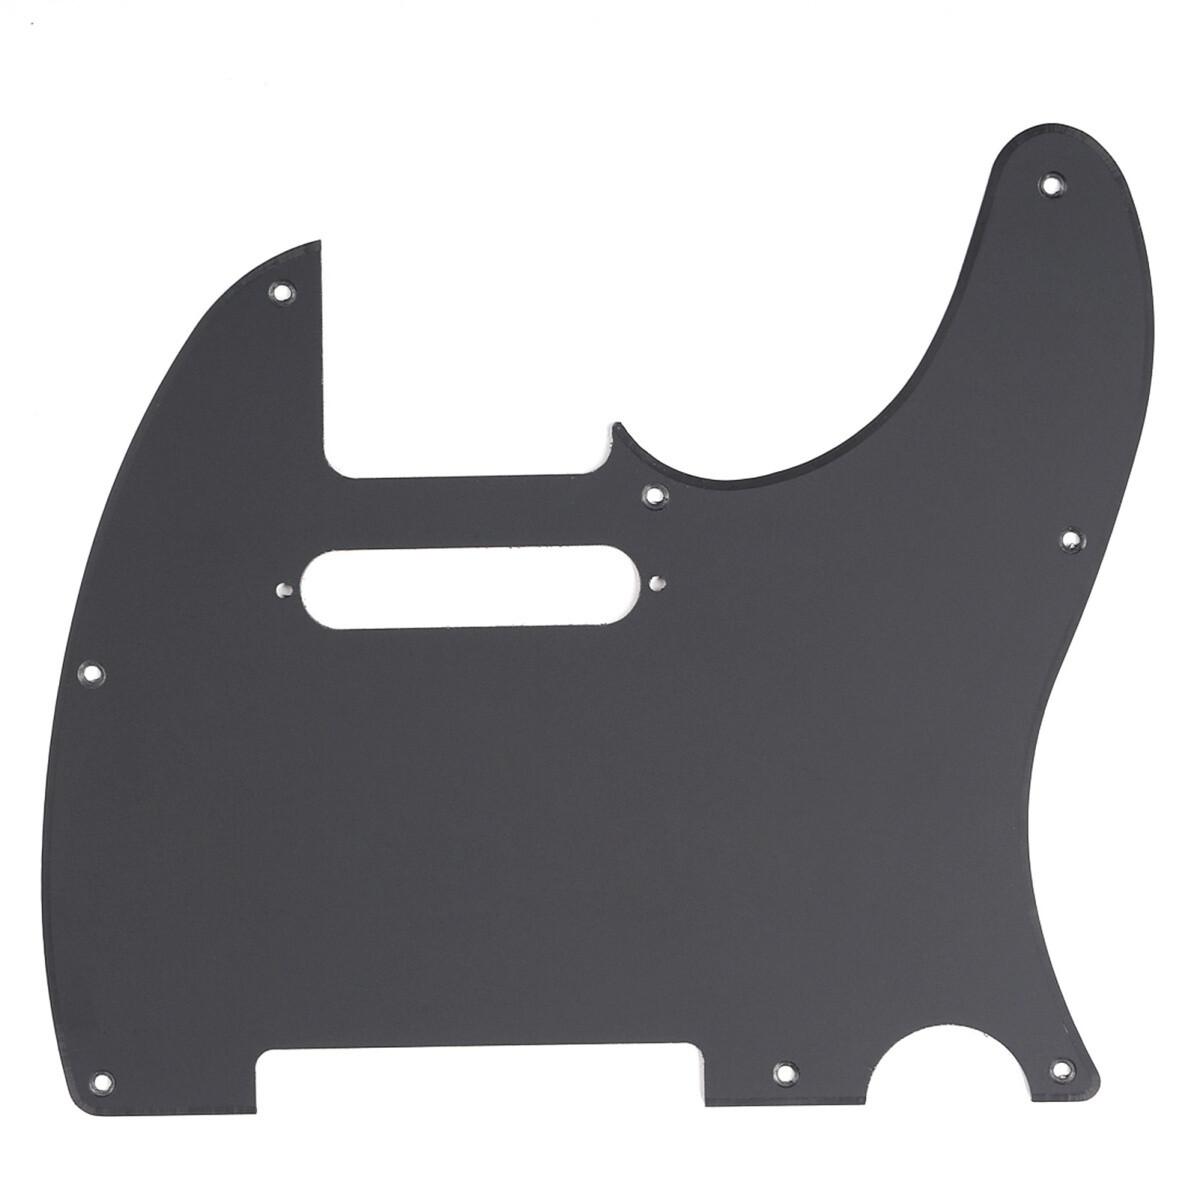 Brio 8 Hole Tele® Pickguard RH 1 Ply Matte Black